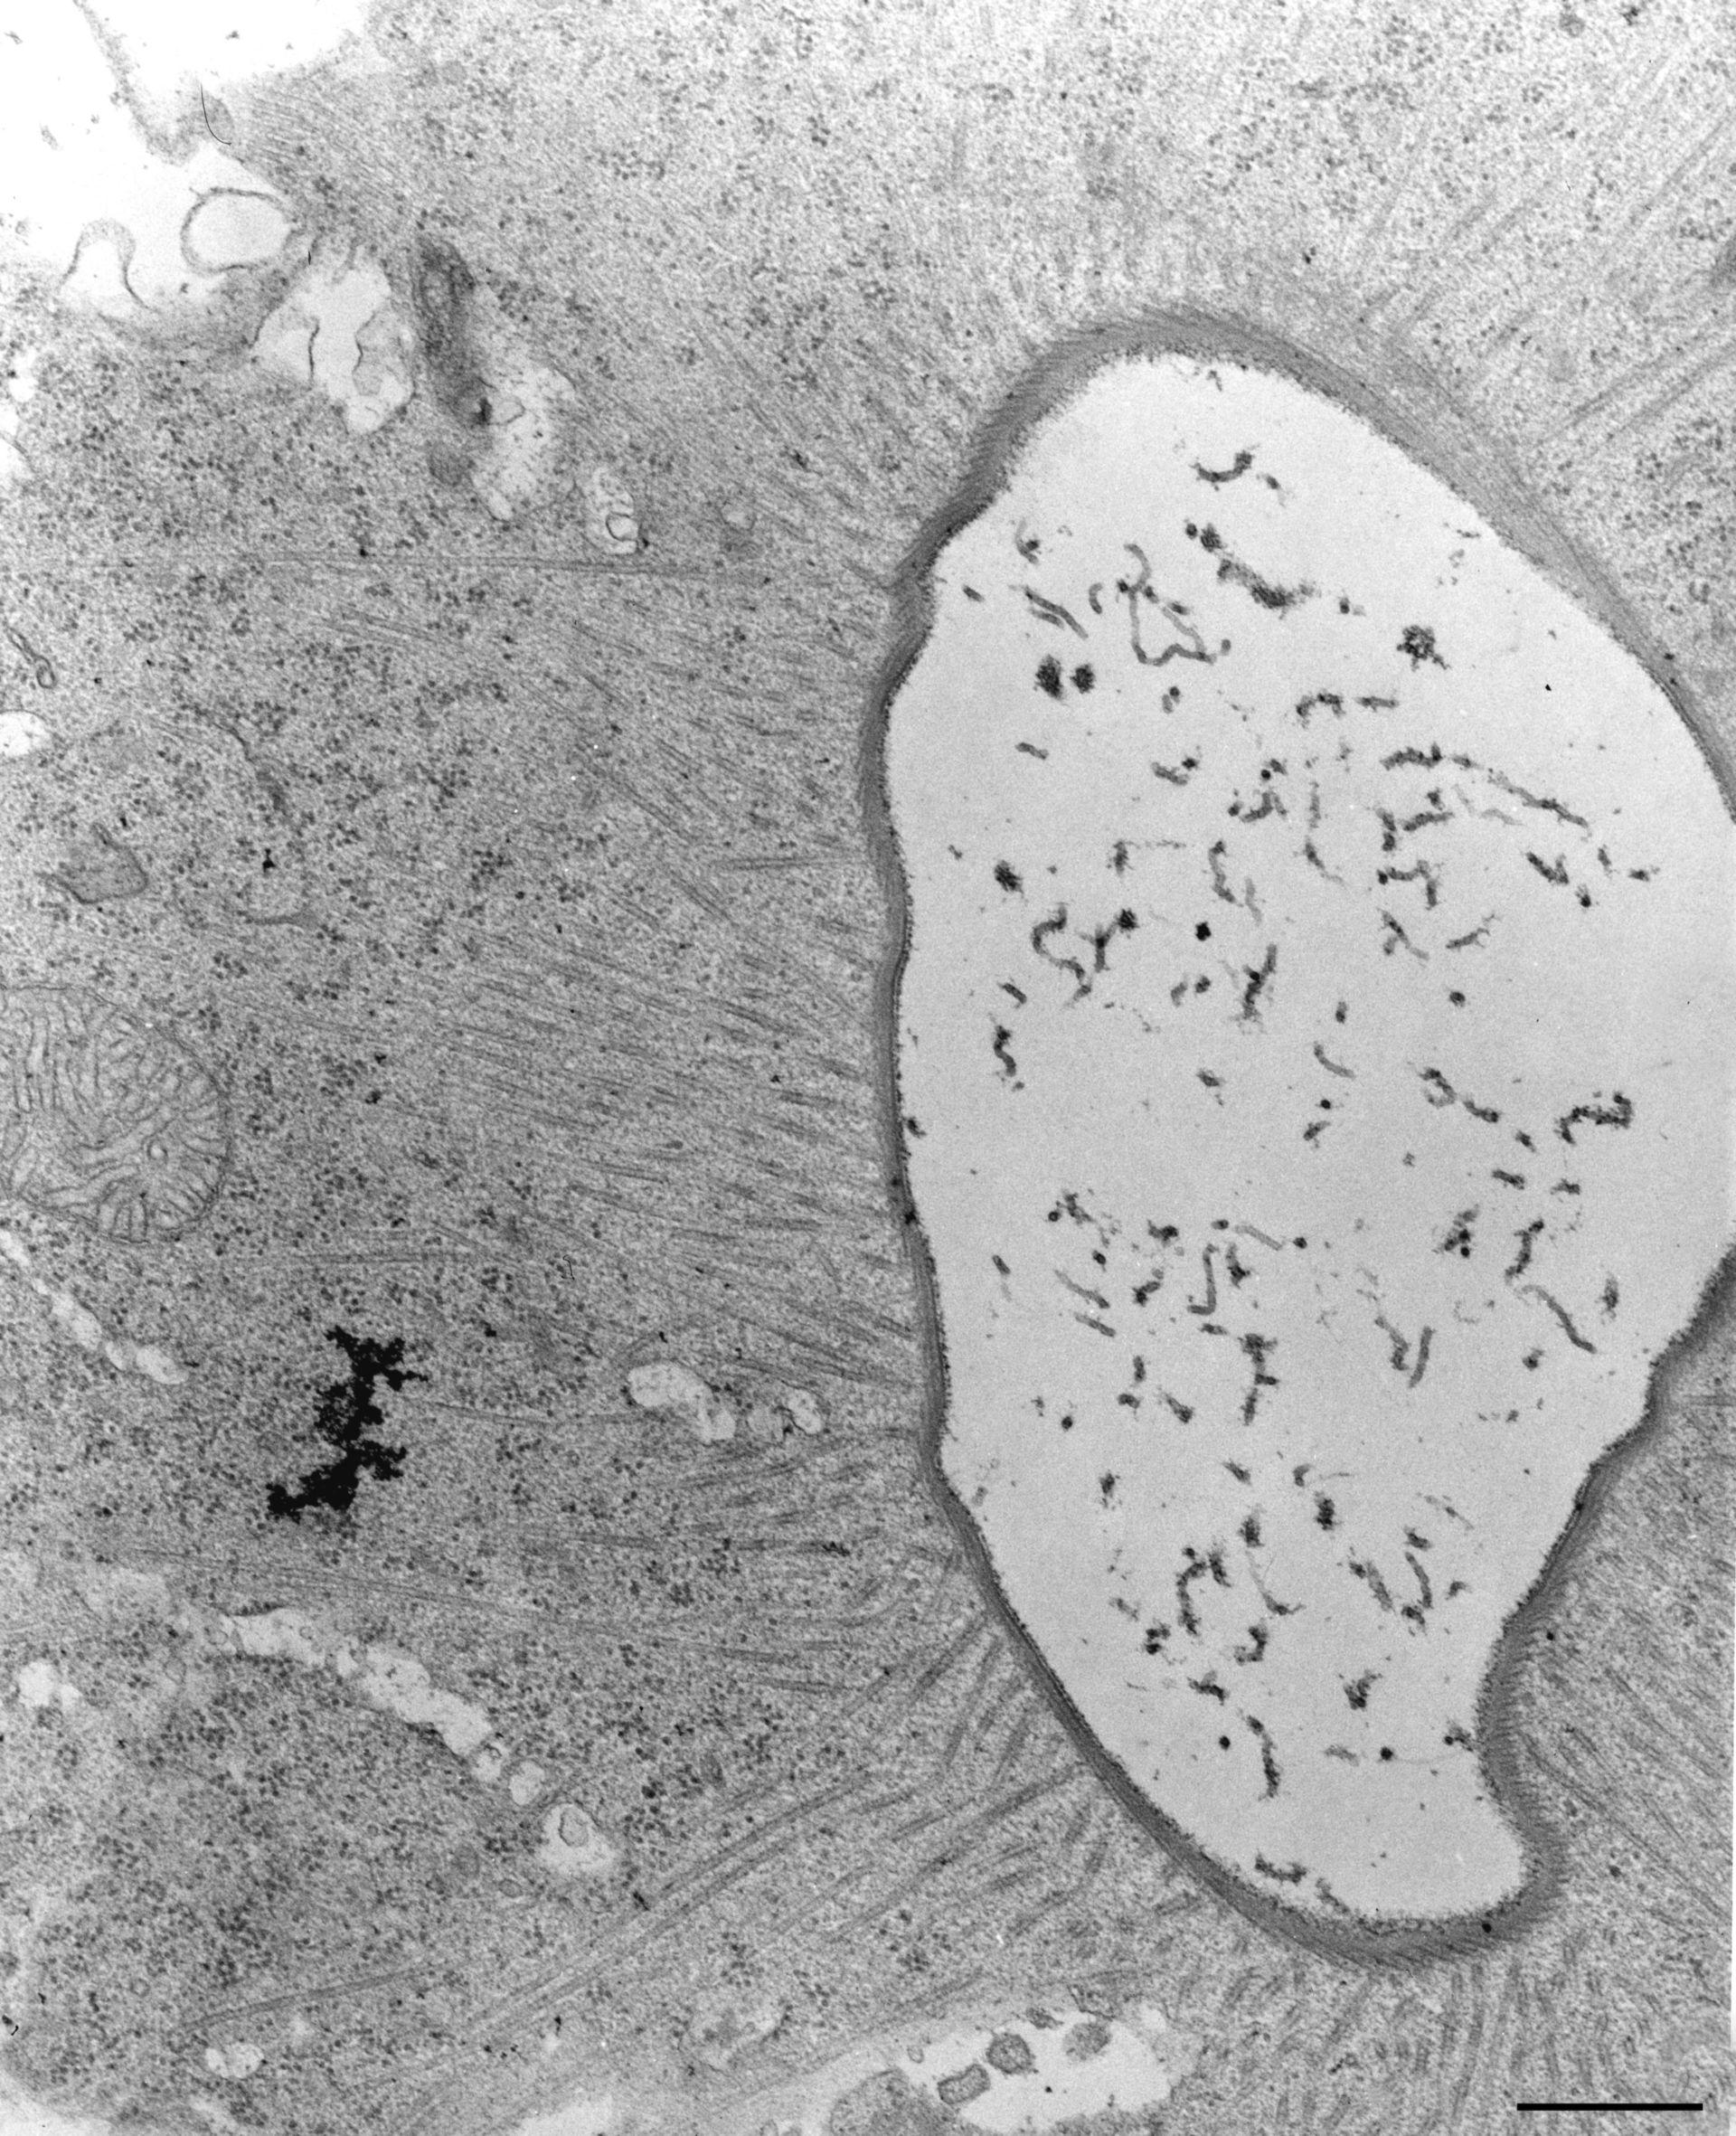 Nassula (Cytoplasm) - CIL:12313